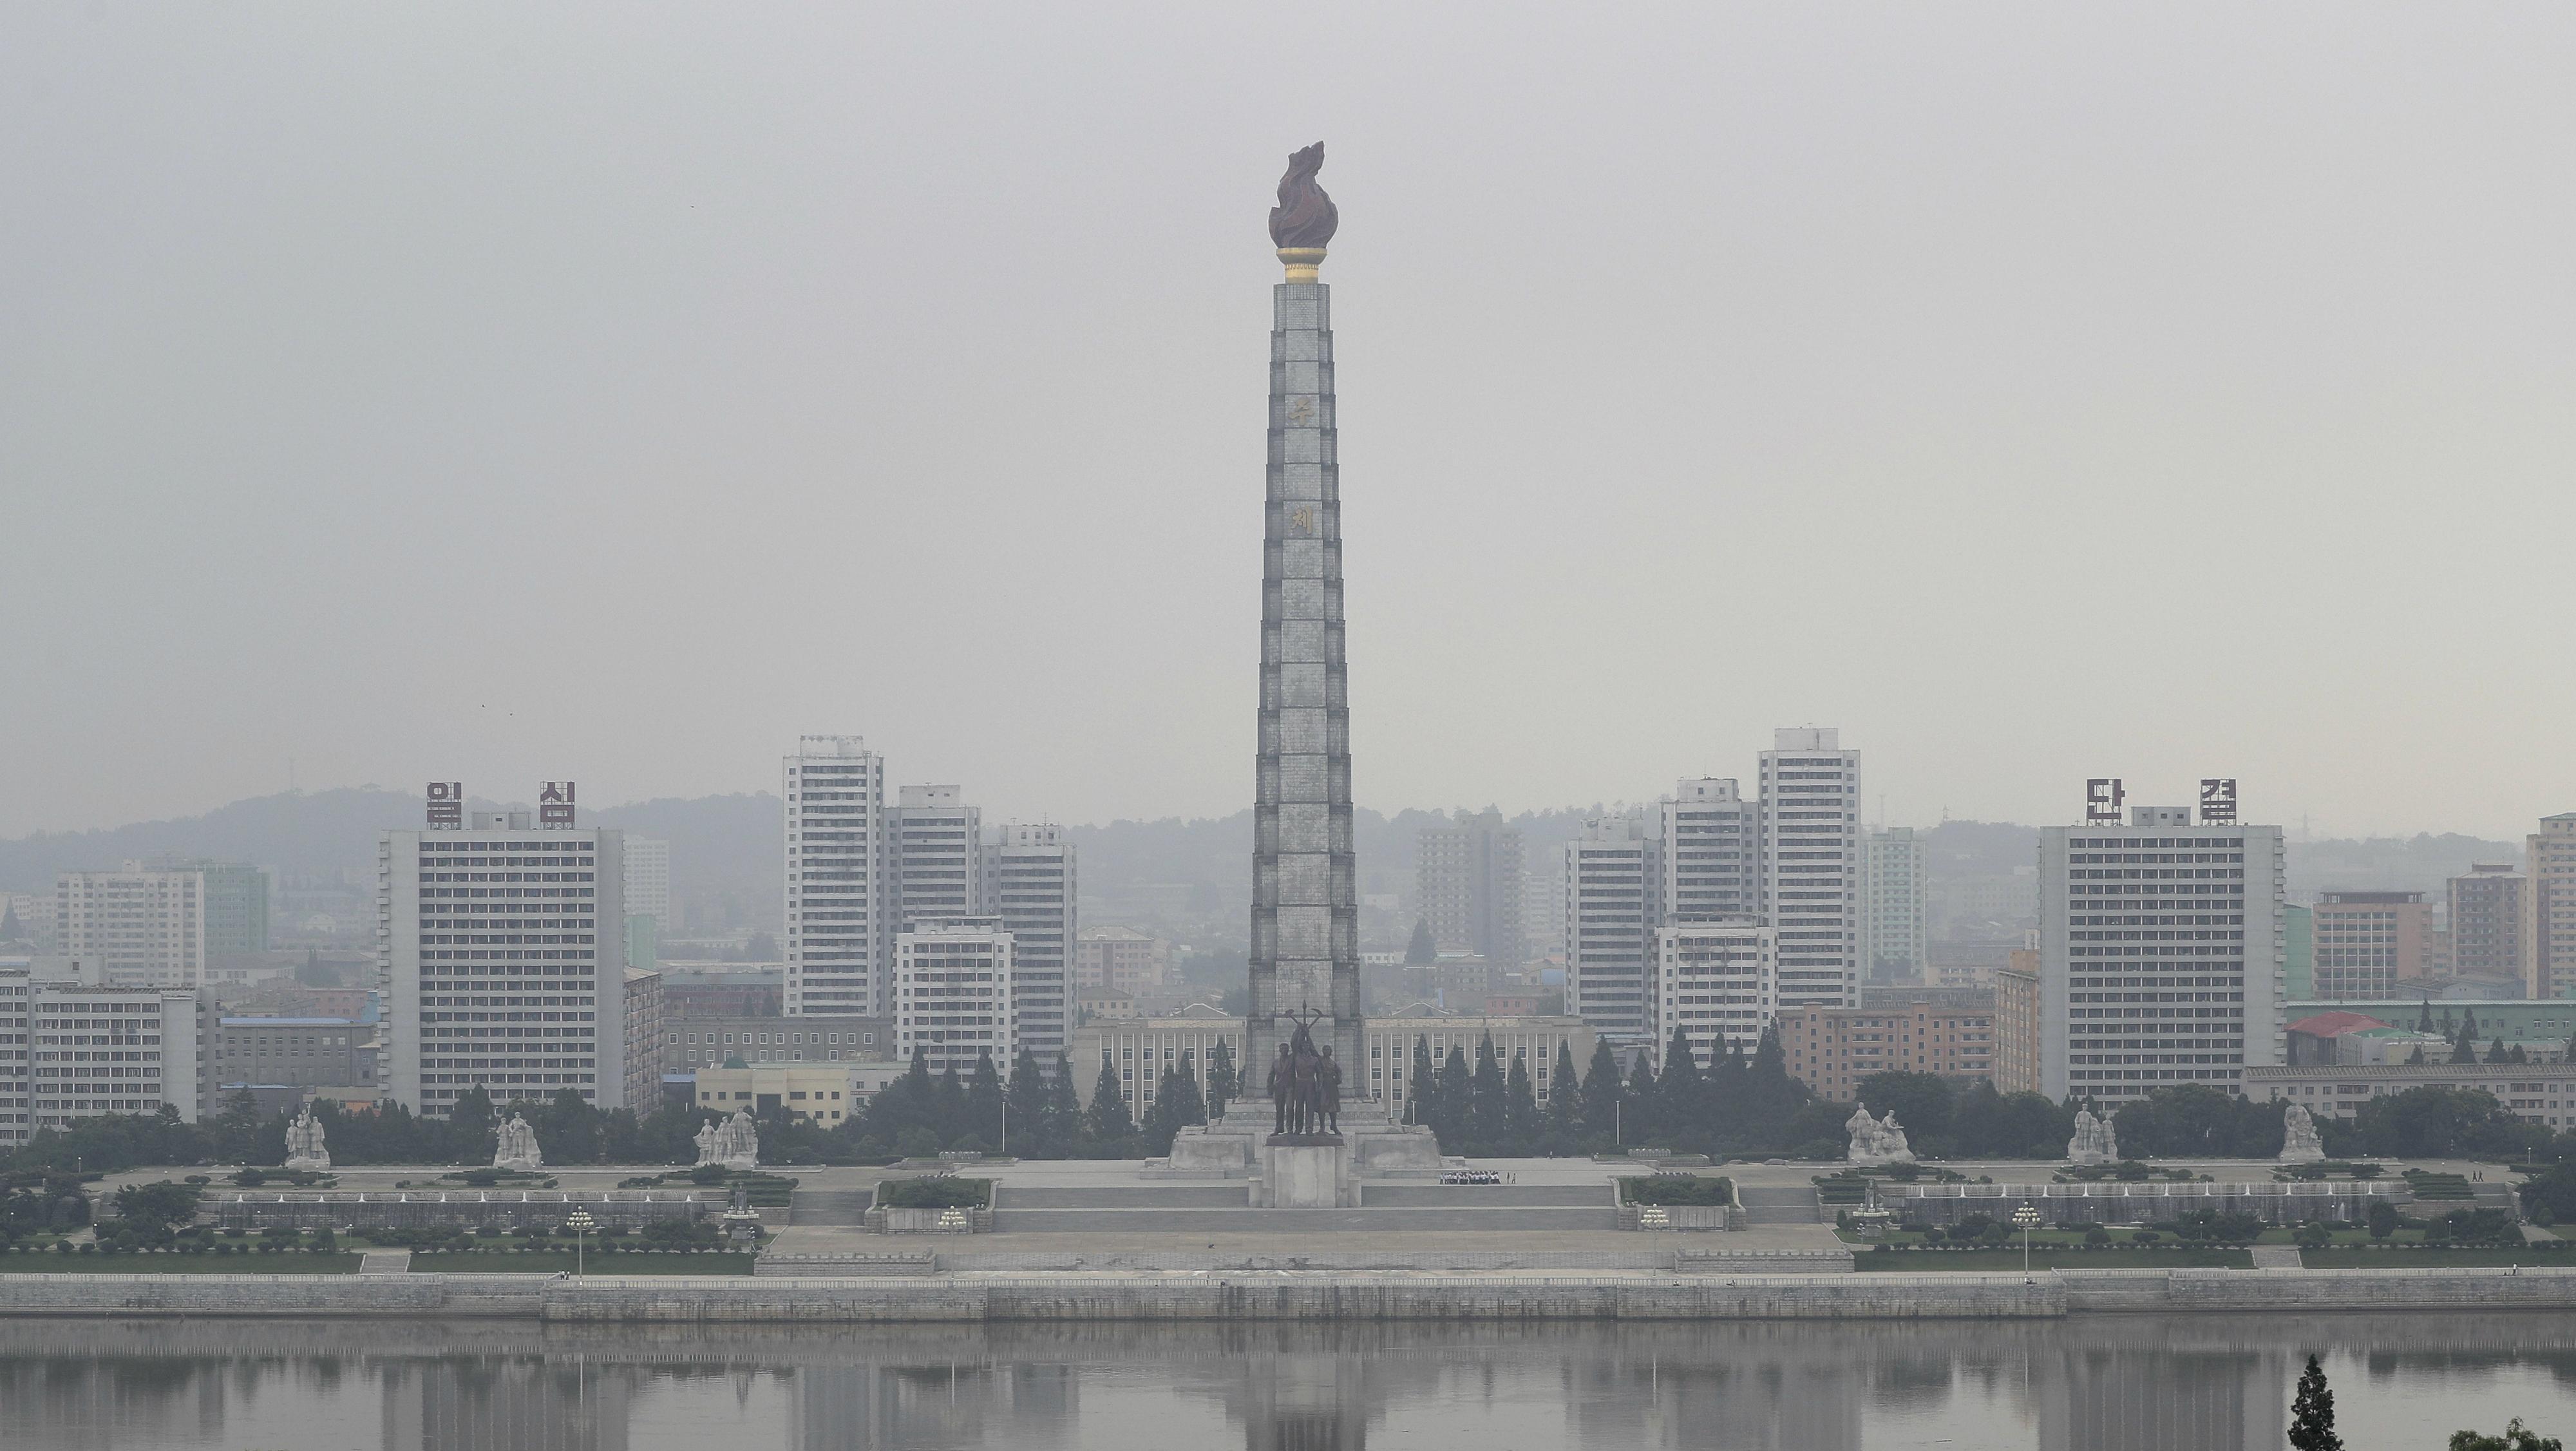 c-nk-city-AP_17205182485269